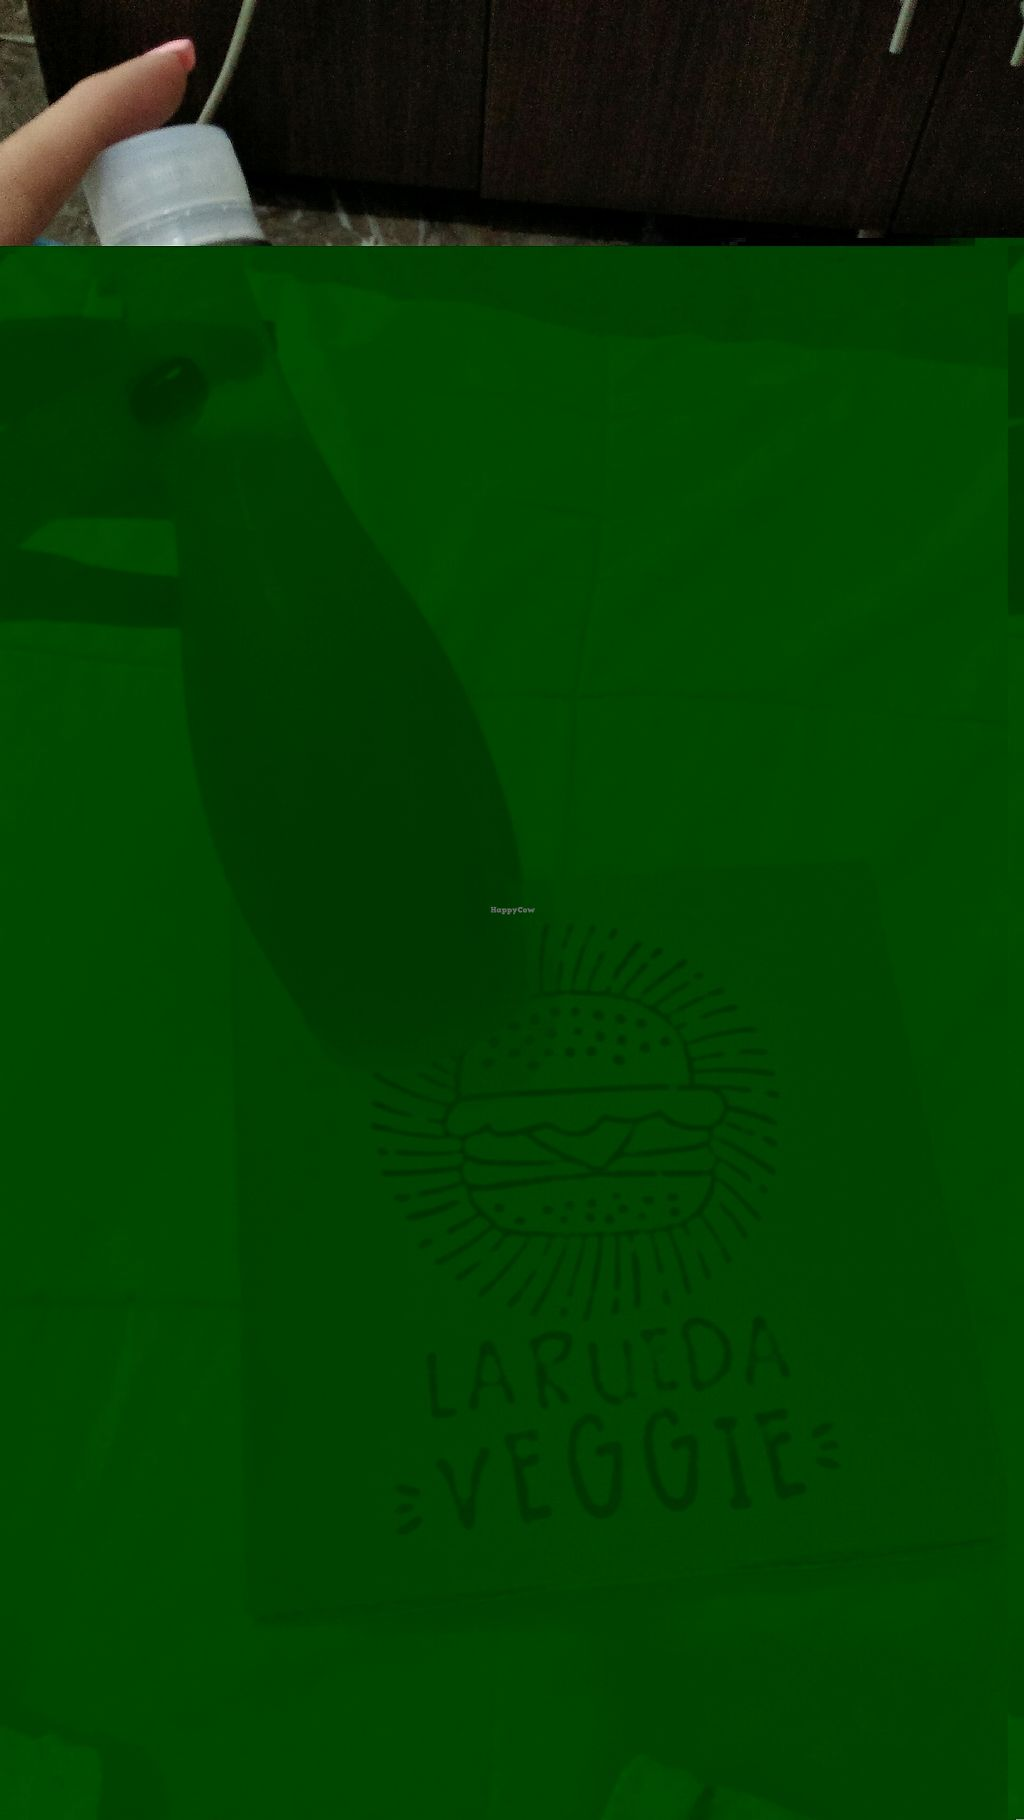 "Photo of La Rueda Veggie  by <a href=""/members/profile/MaryahShdid"">MaryahShdid</a> <br/>Hamburguesa clásica de falafel con cebollas caramelizadas en combo <br/> February 12, 2018  - <a href='/contact/abuse/image/93698/358561'>Report</a>"